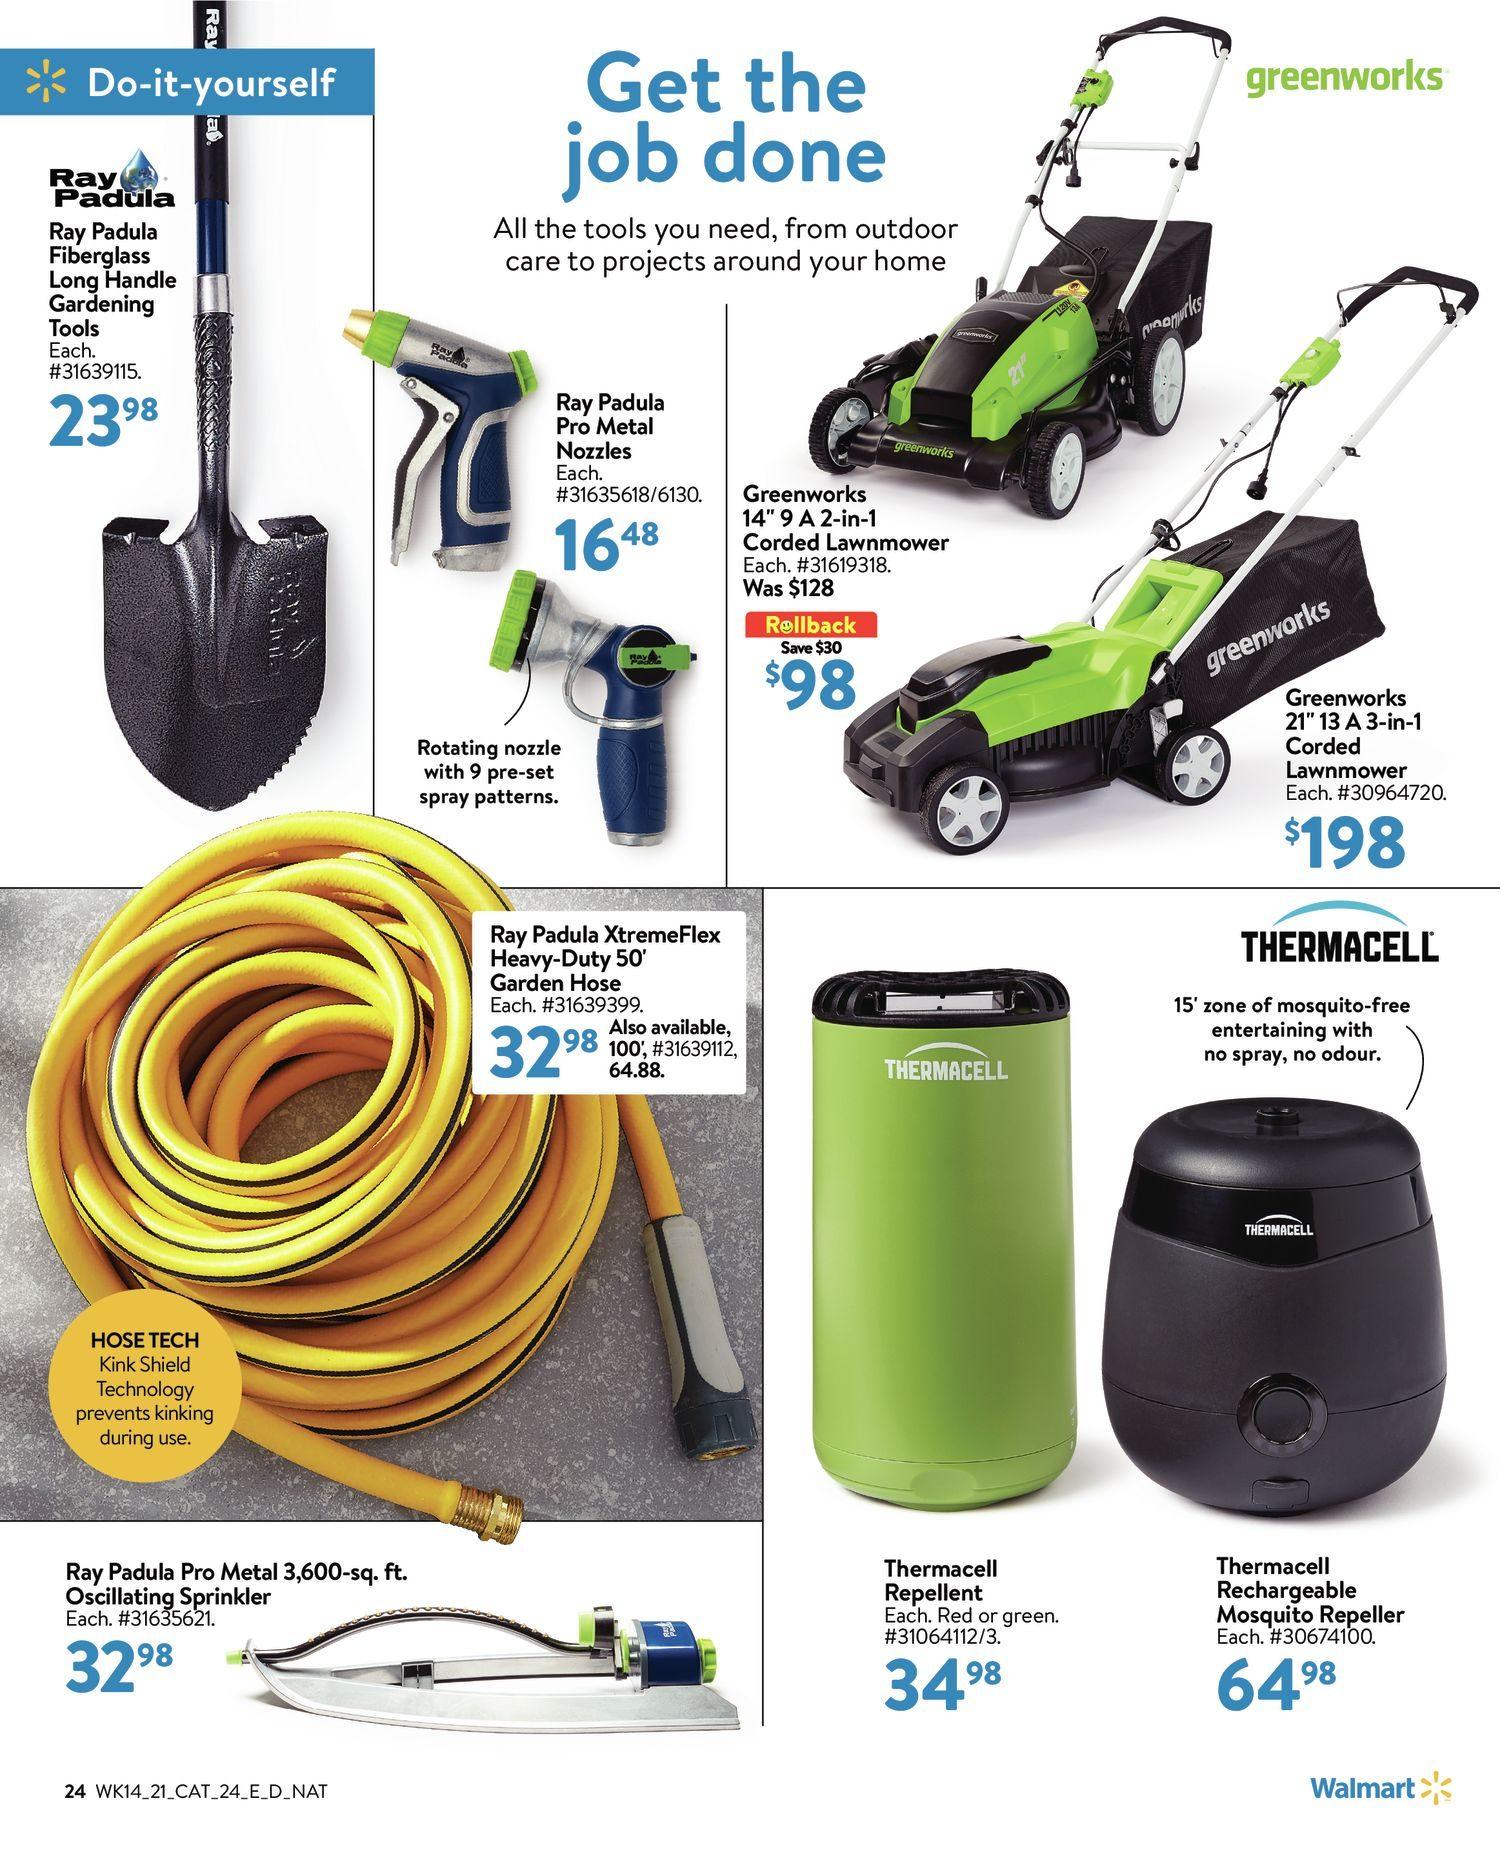 Walmart - Weekends Book - Page 24